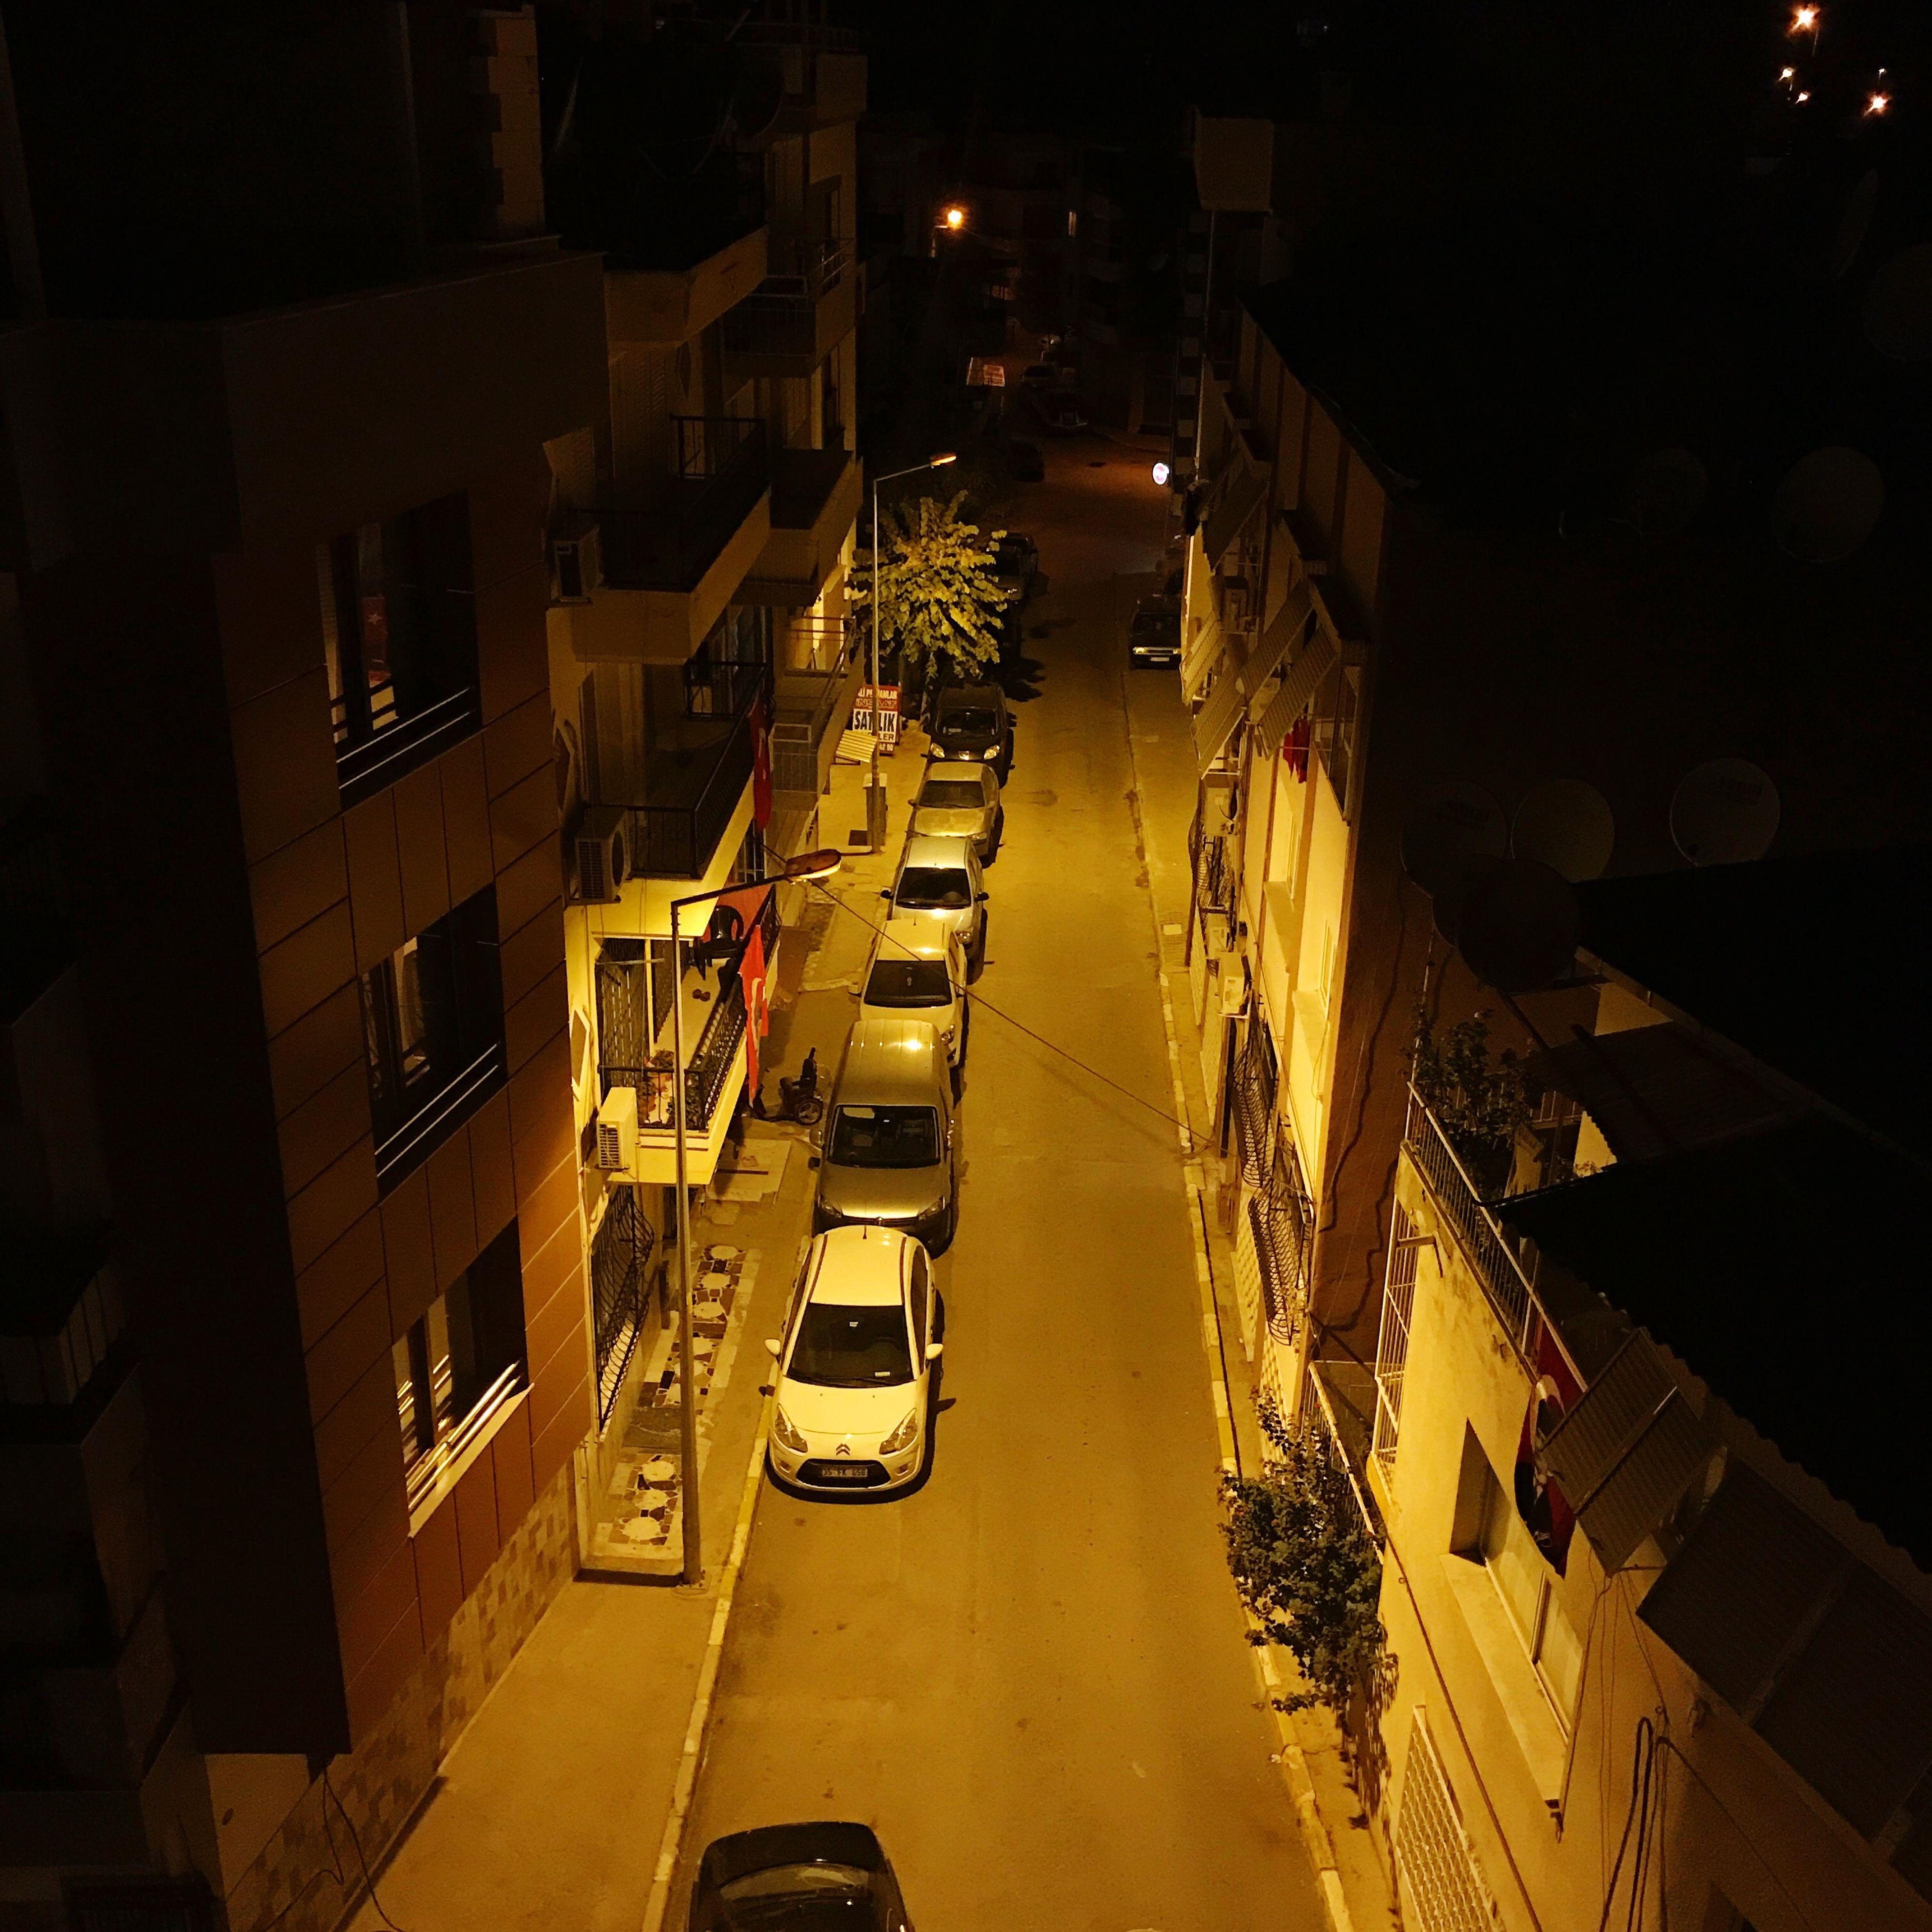 Night Nightphotography Streetphotography Street Unemployed Unemployednight Turkey Cars Streetlamp City 💡🚗